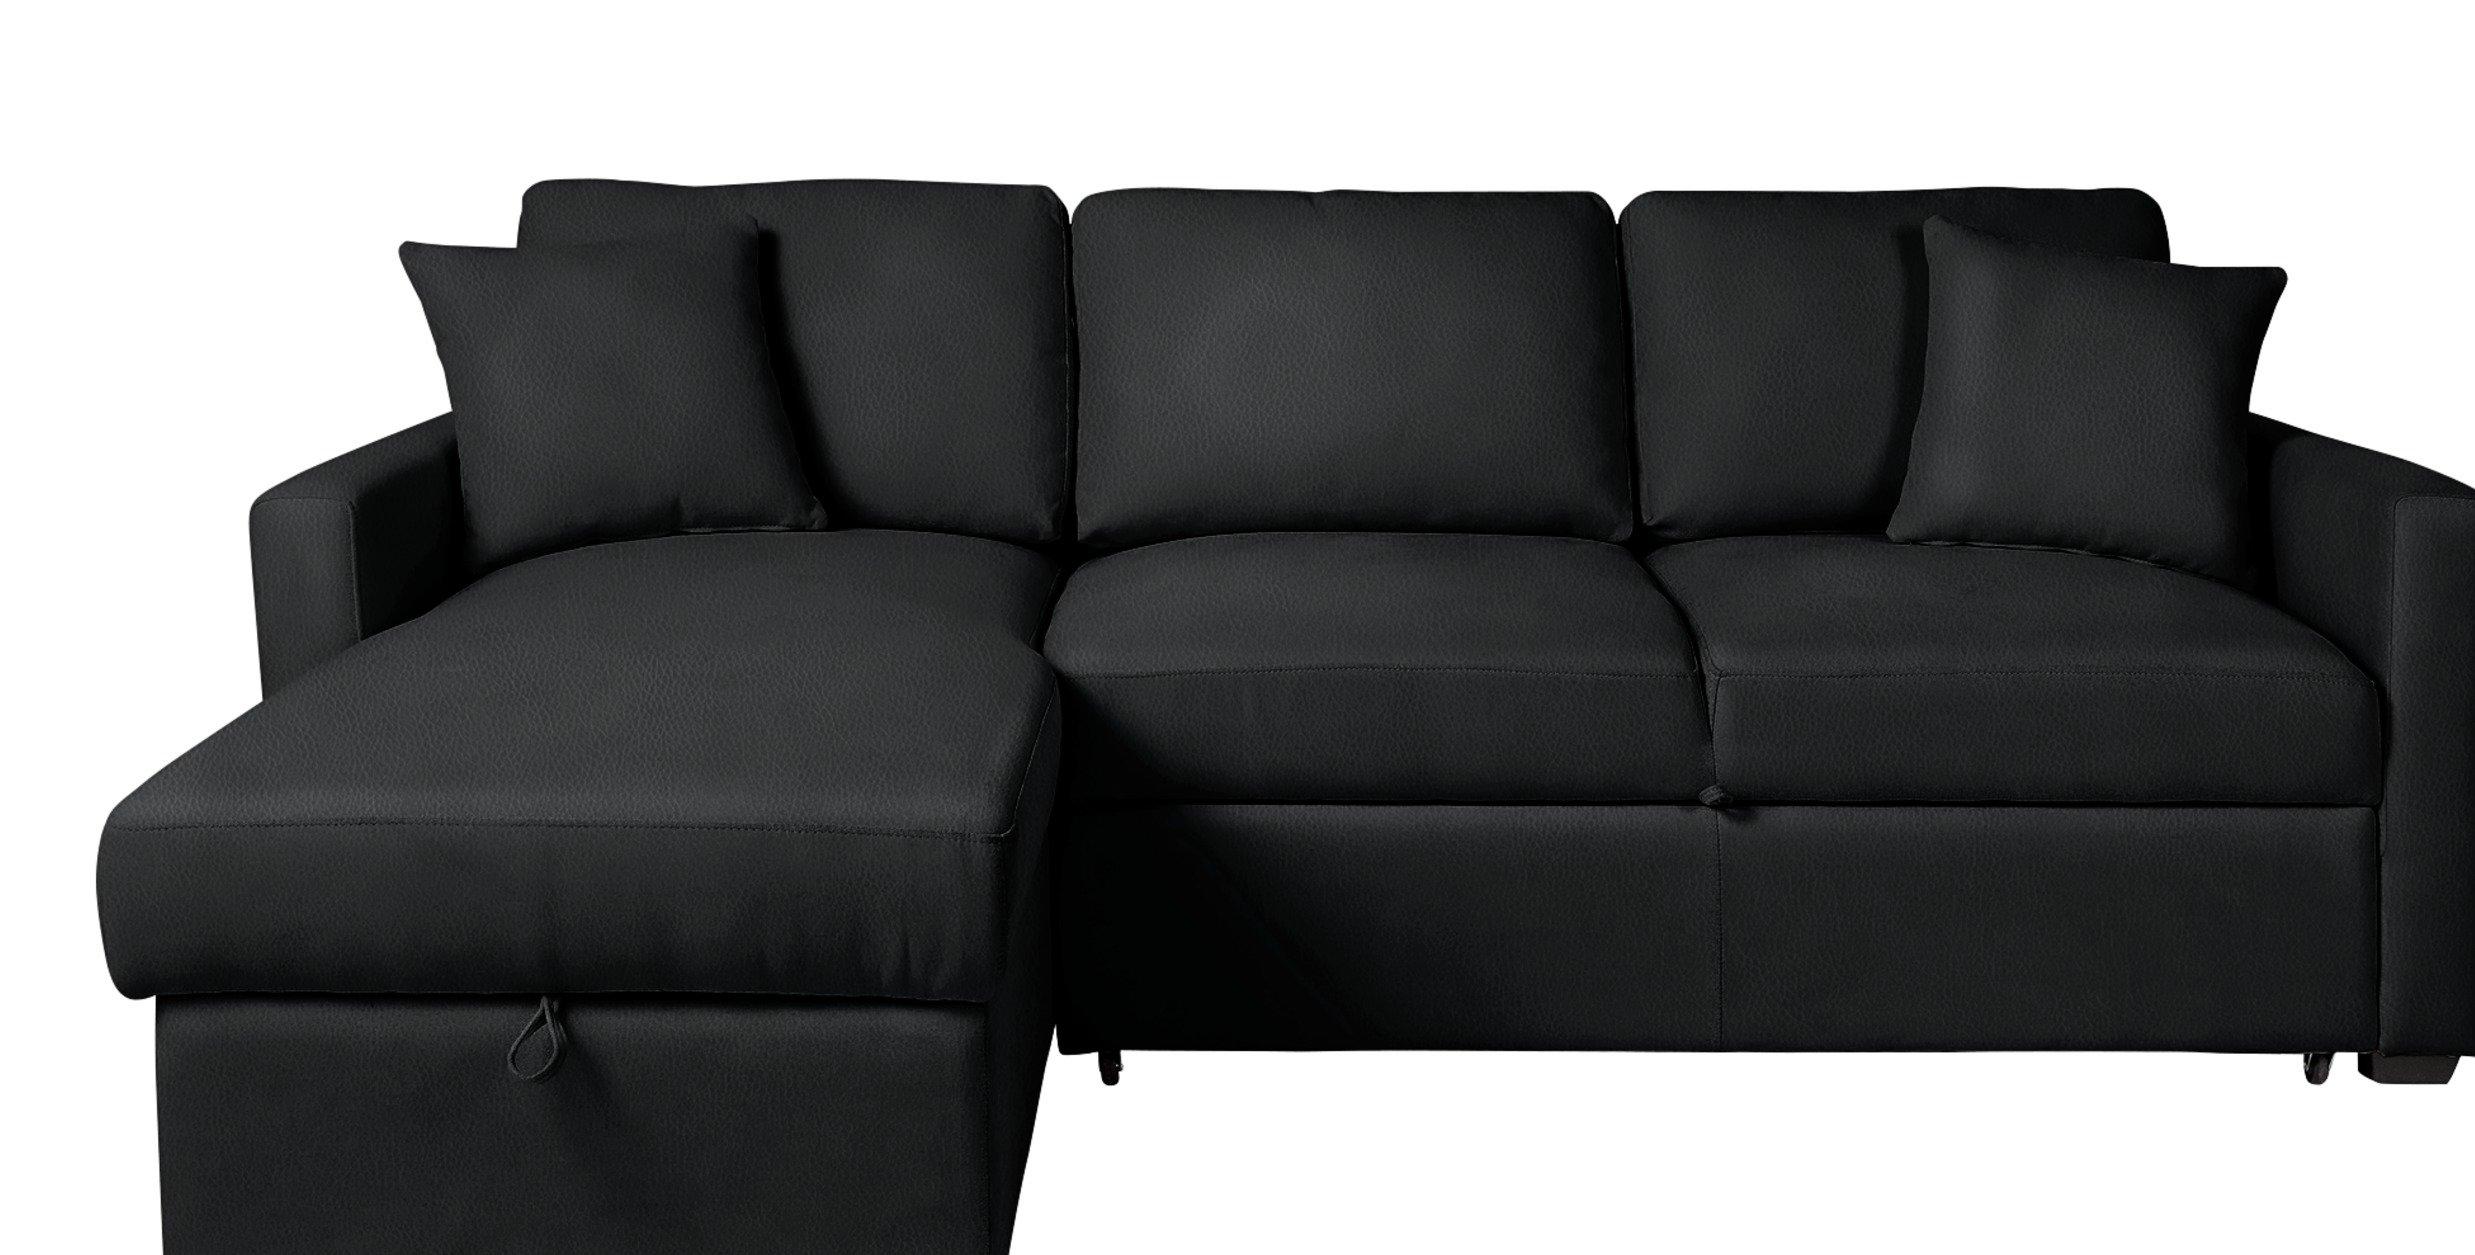 Buy Argos Home Reagan Left Corner Faux Leather Sofa Bed - Black